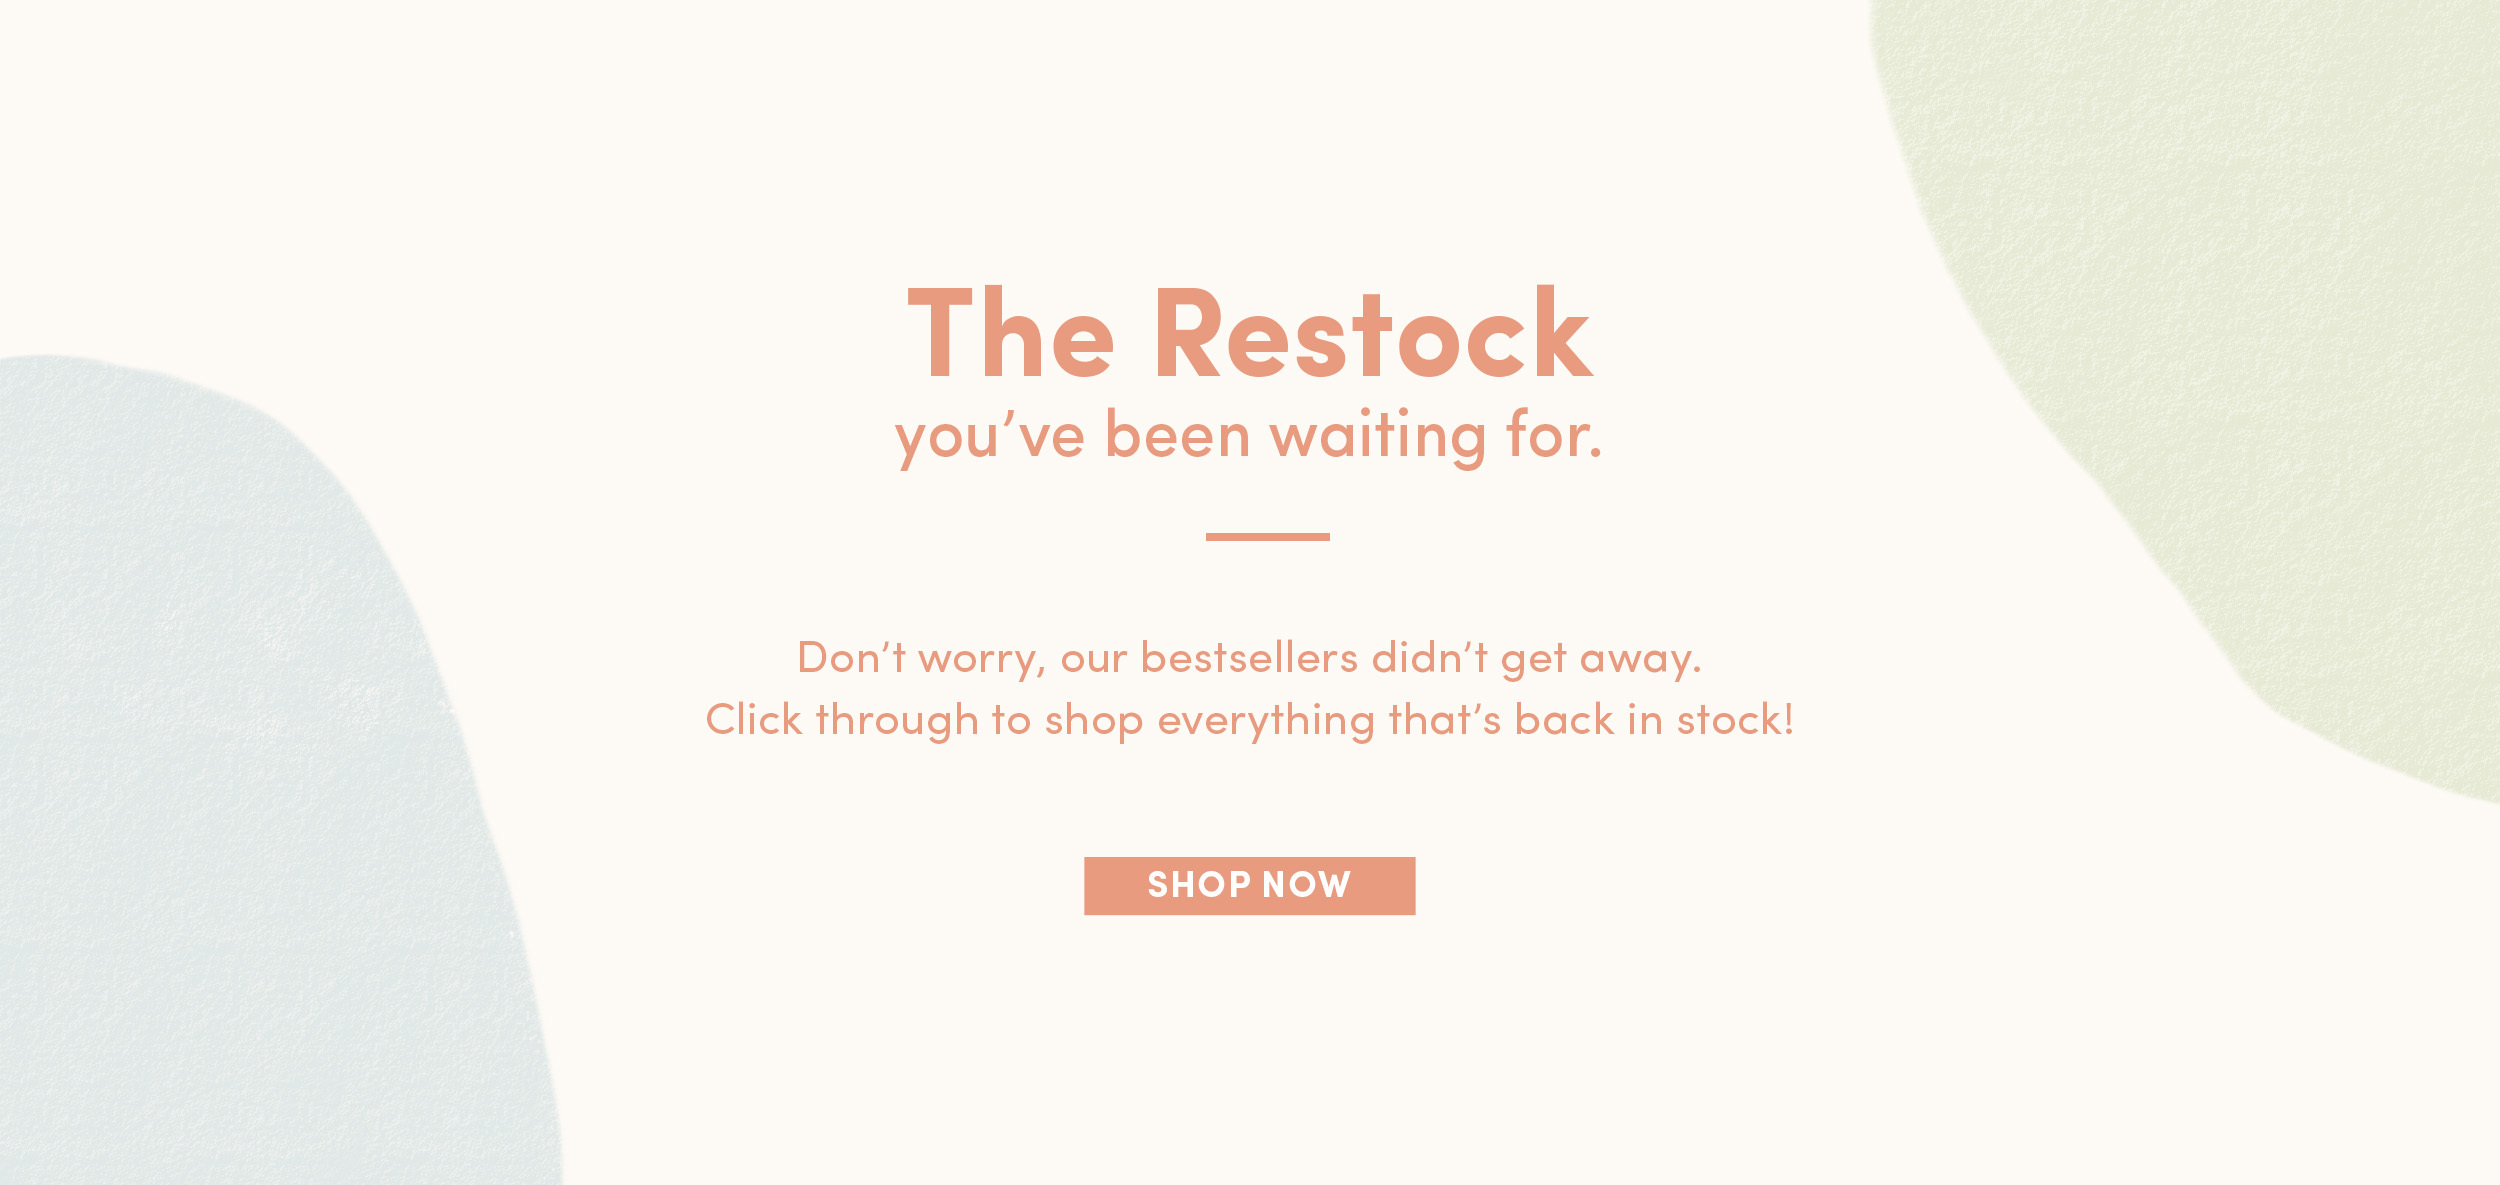 The Restock